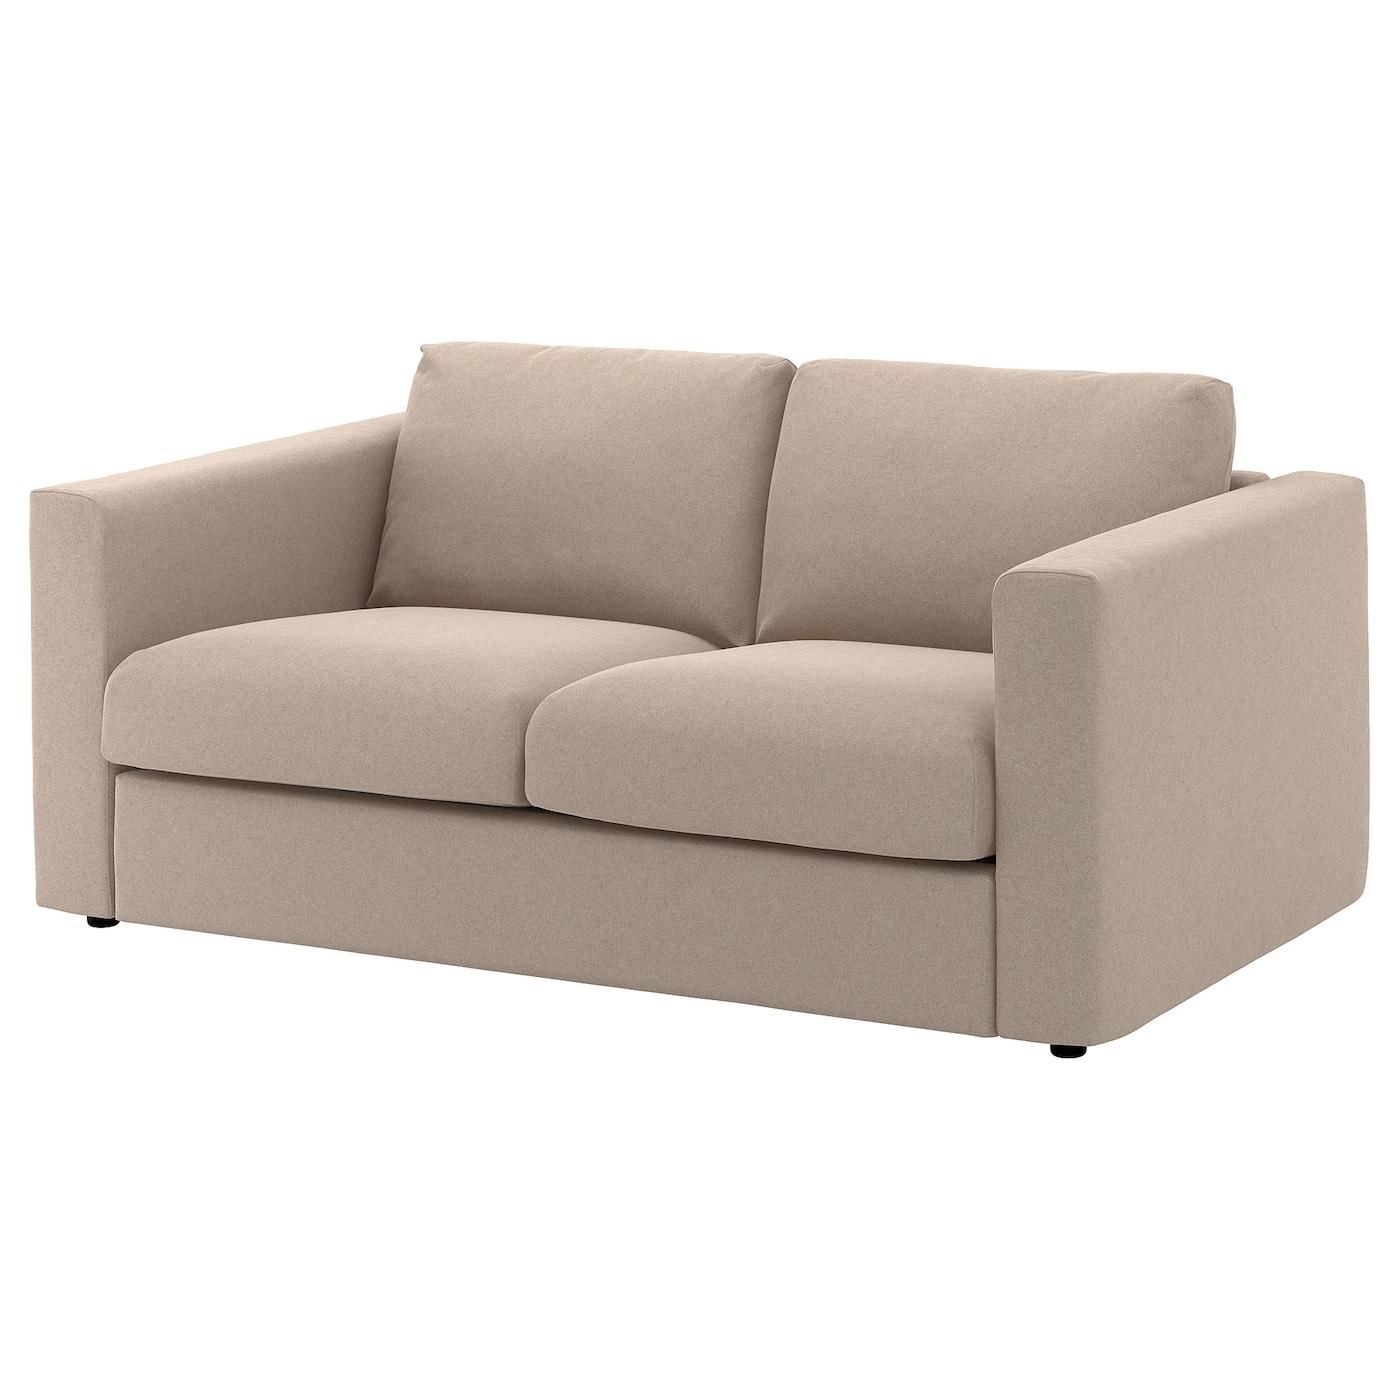 2 Seat Sofa Olx – Title